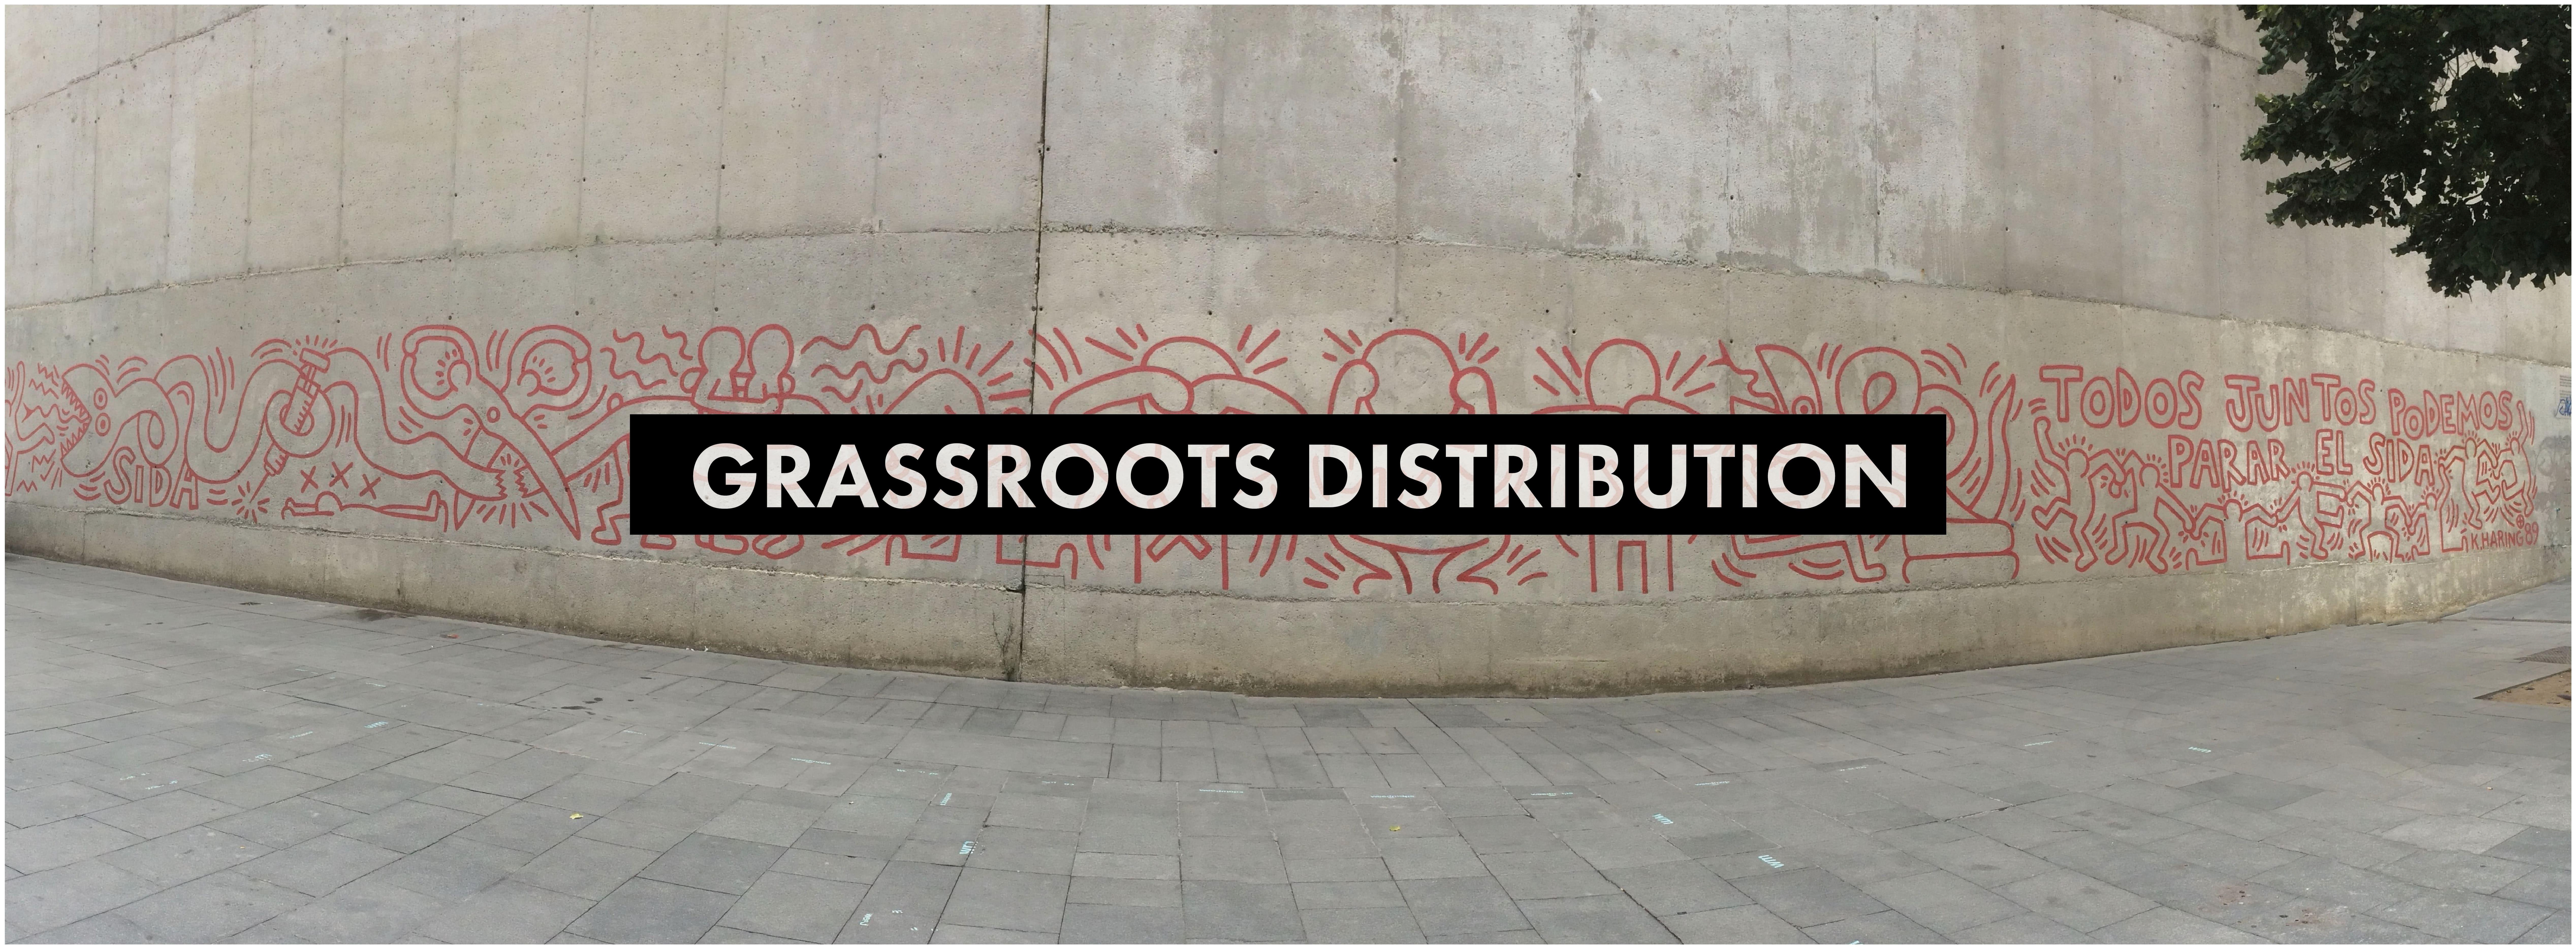 Grassroots Distribution